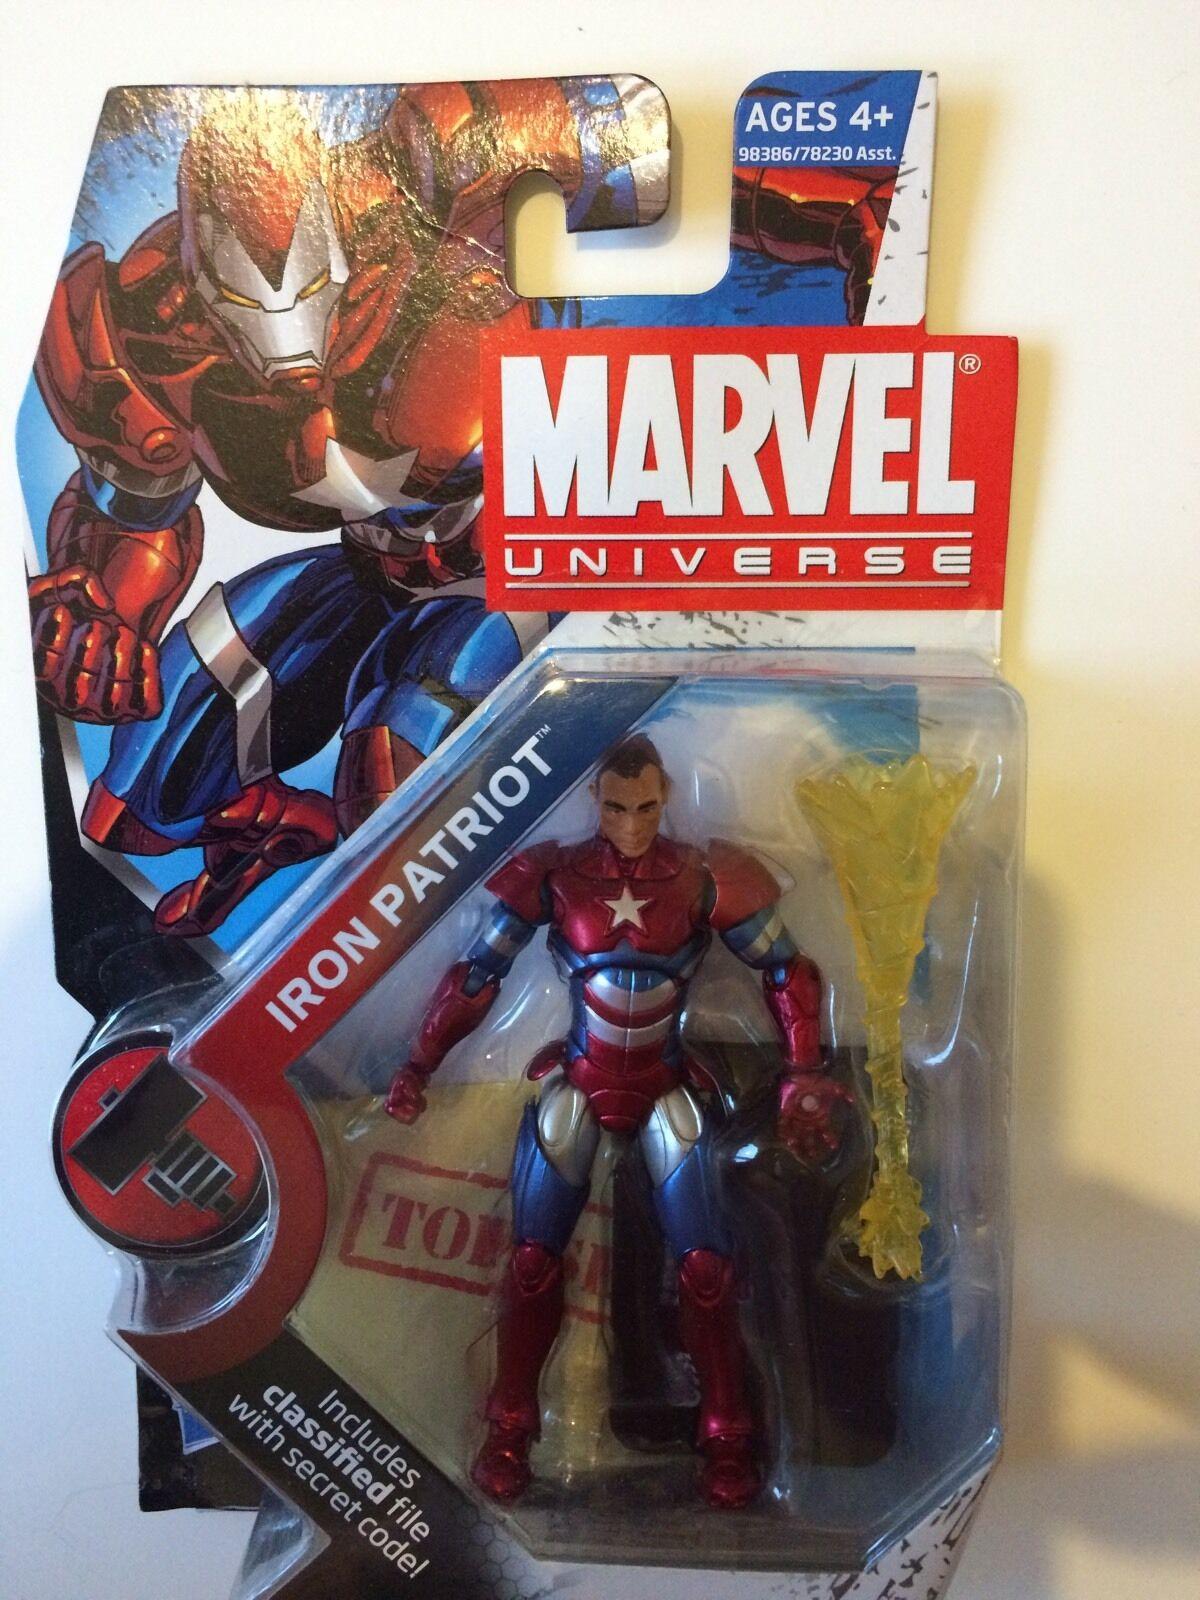 Marvel Universe Avengers Infinite figures 3.75  Brand New MOC Iron Patriot